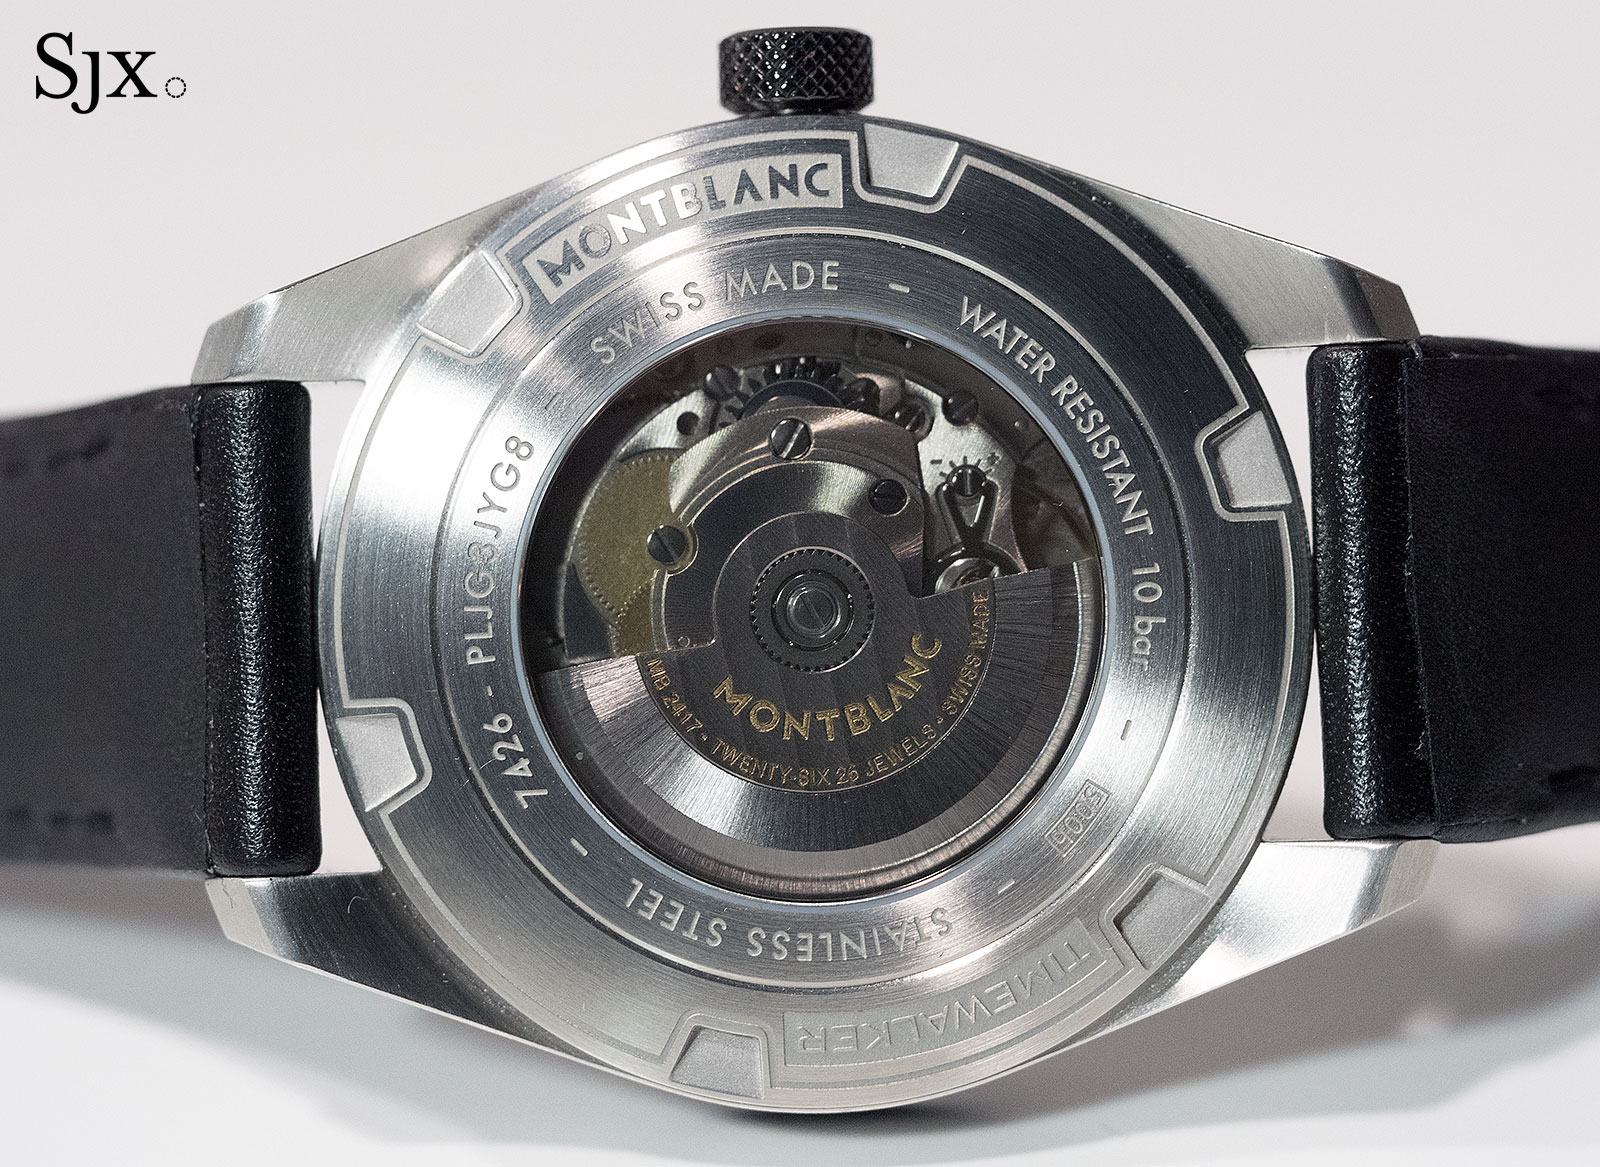 Montblanc TimeWalker Automatic Date 2